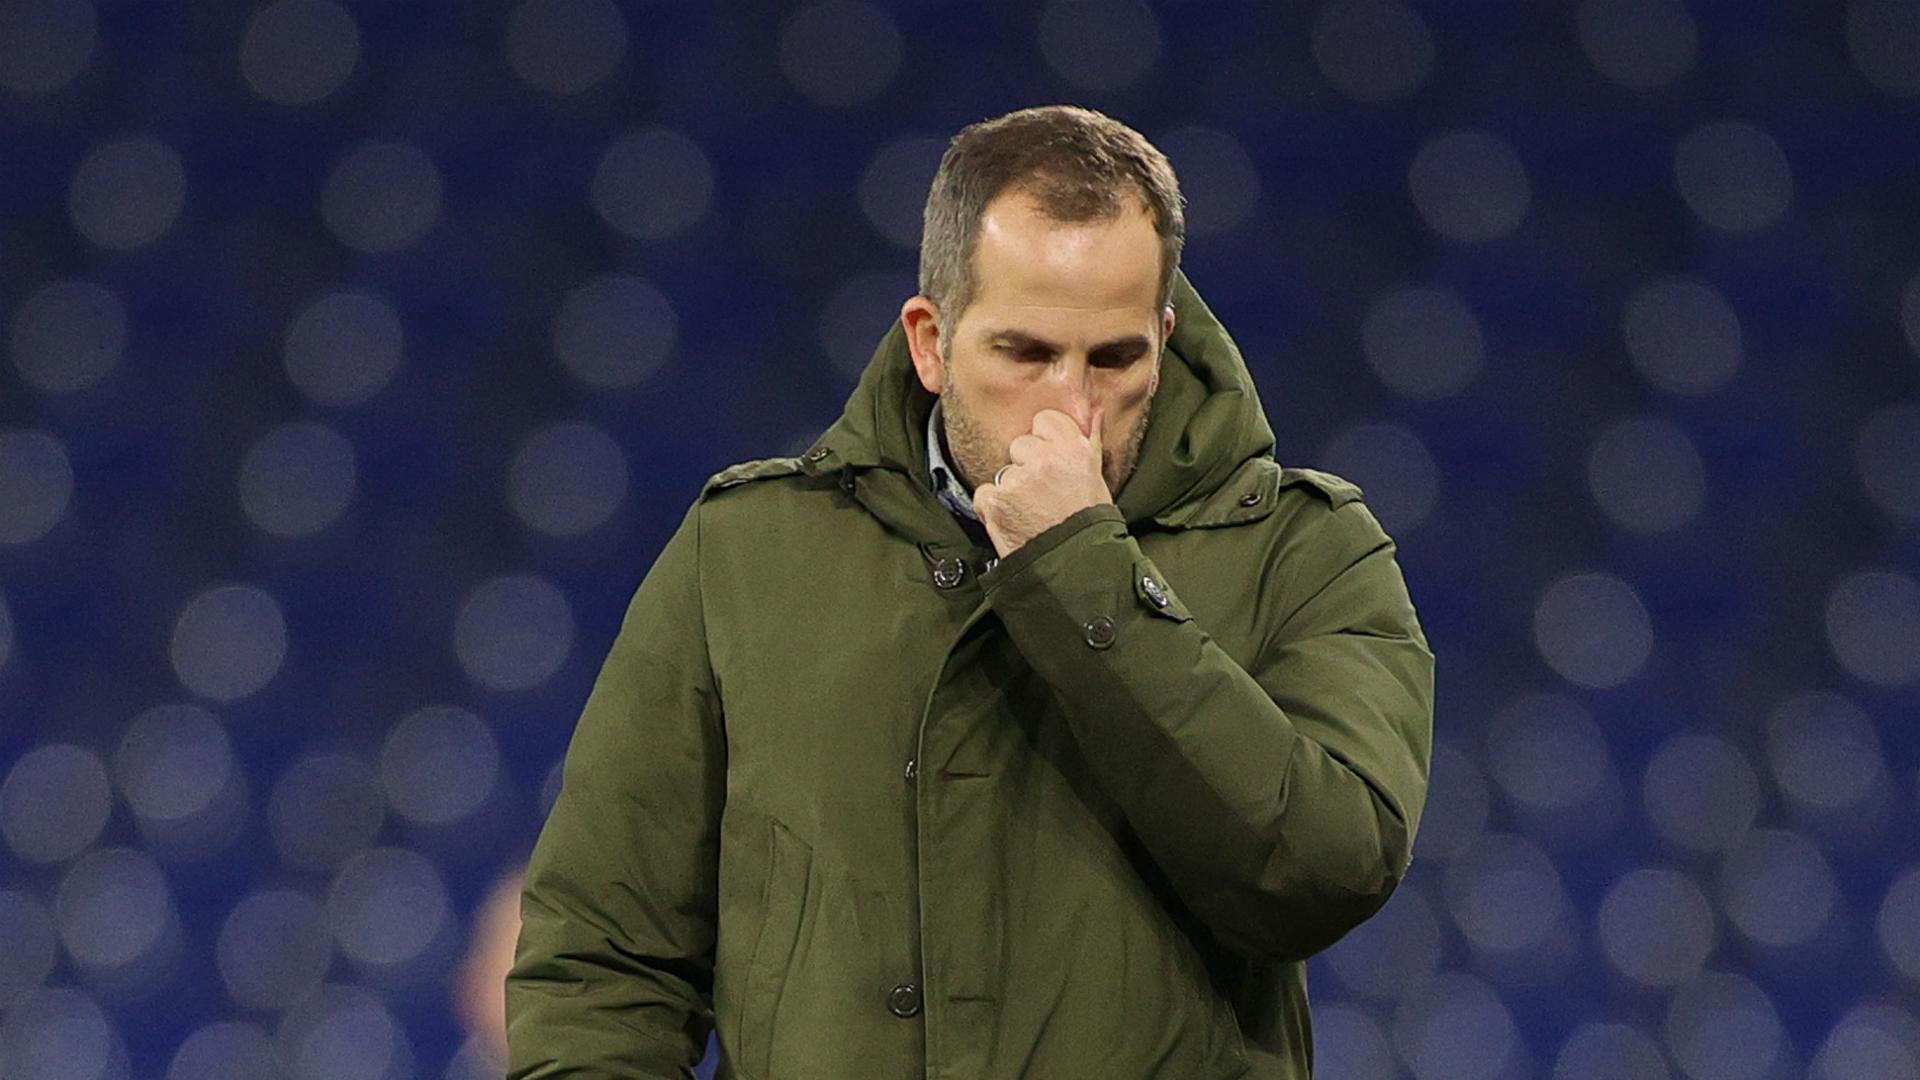 Schalke sack second head coach of season as Baum gets the boot